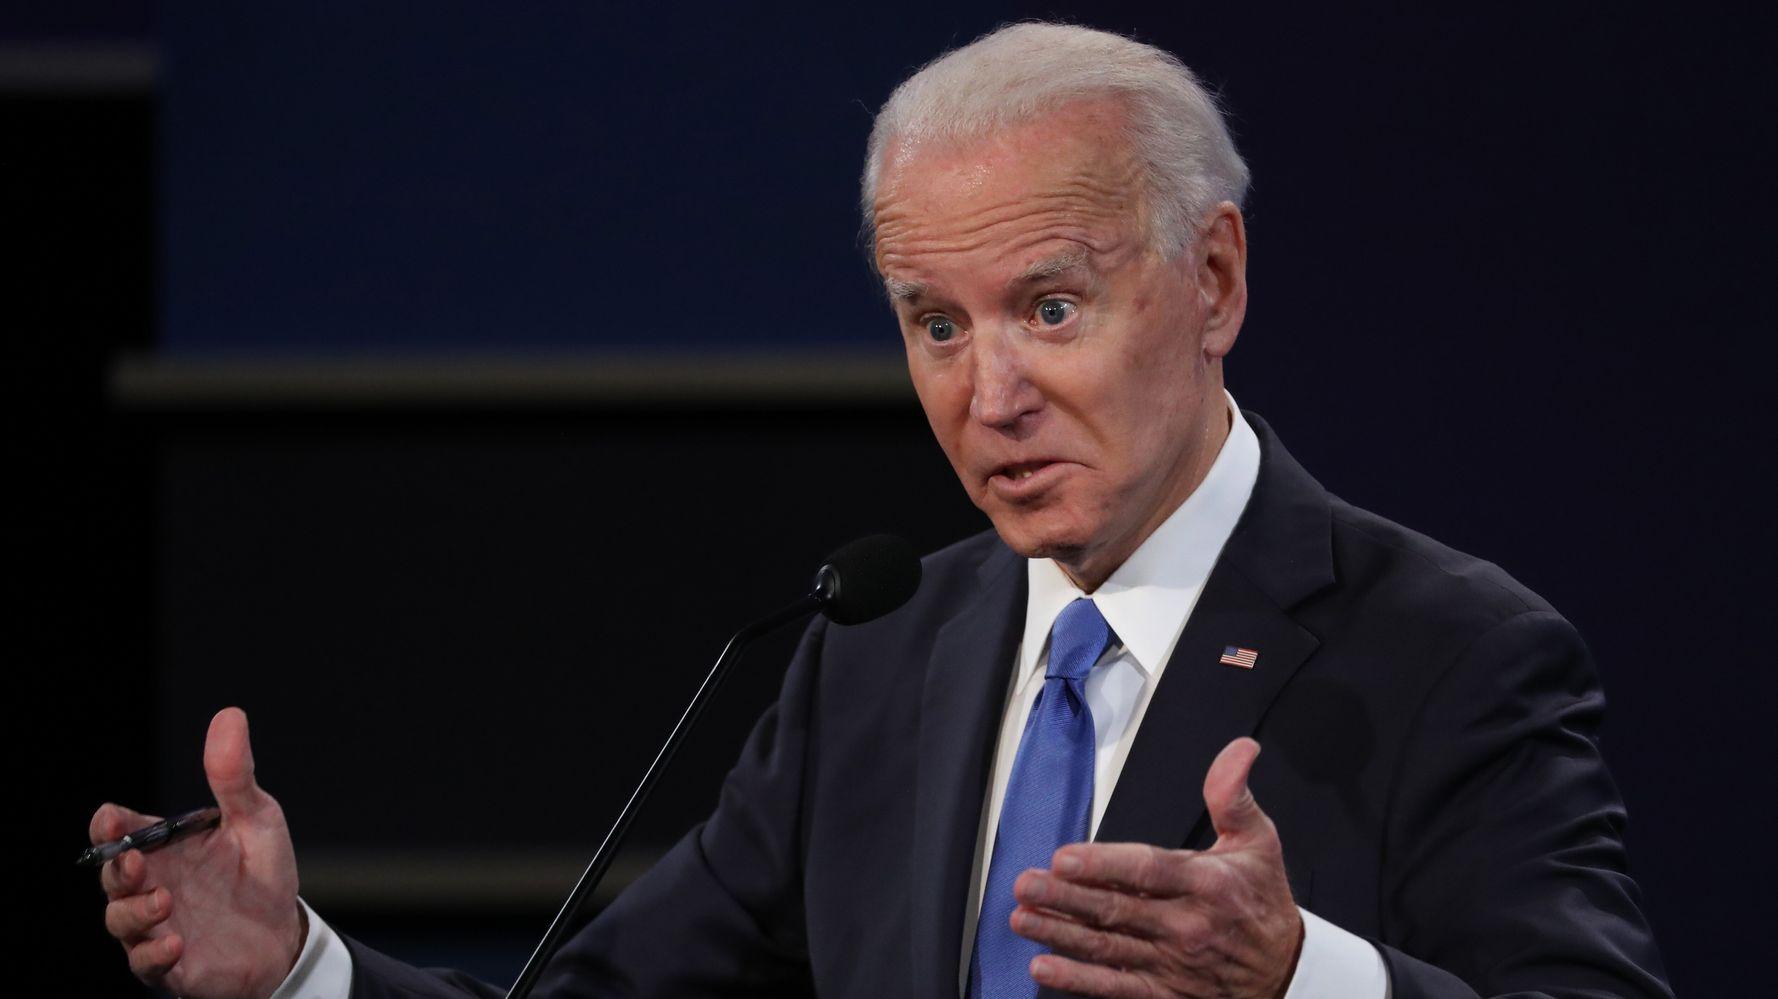 Here Is One Health Care Pledge Biden Shouldn't Make